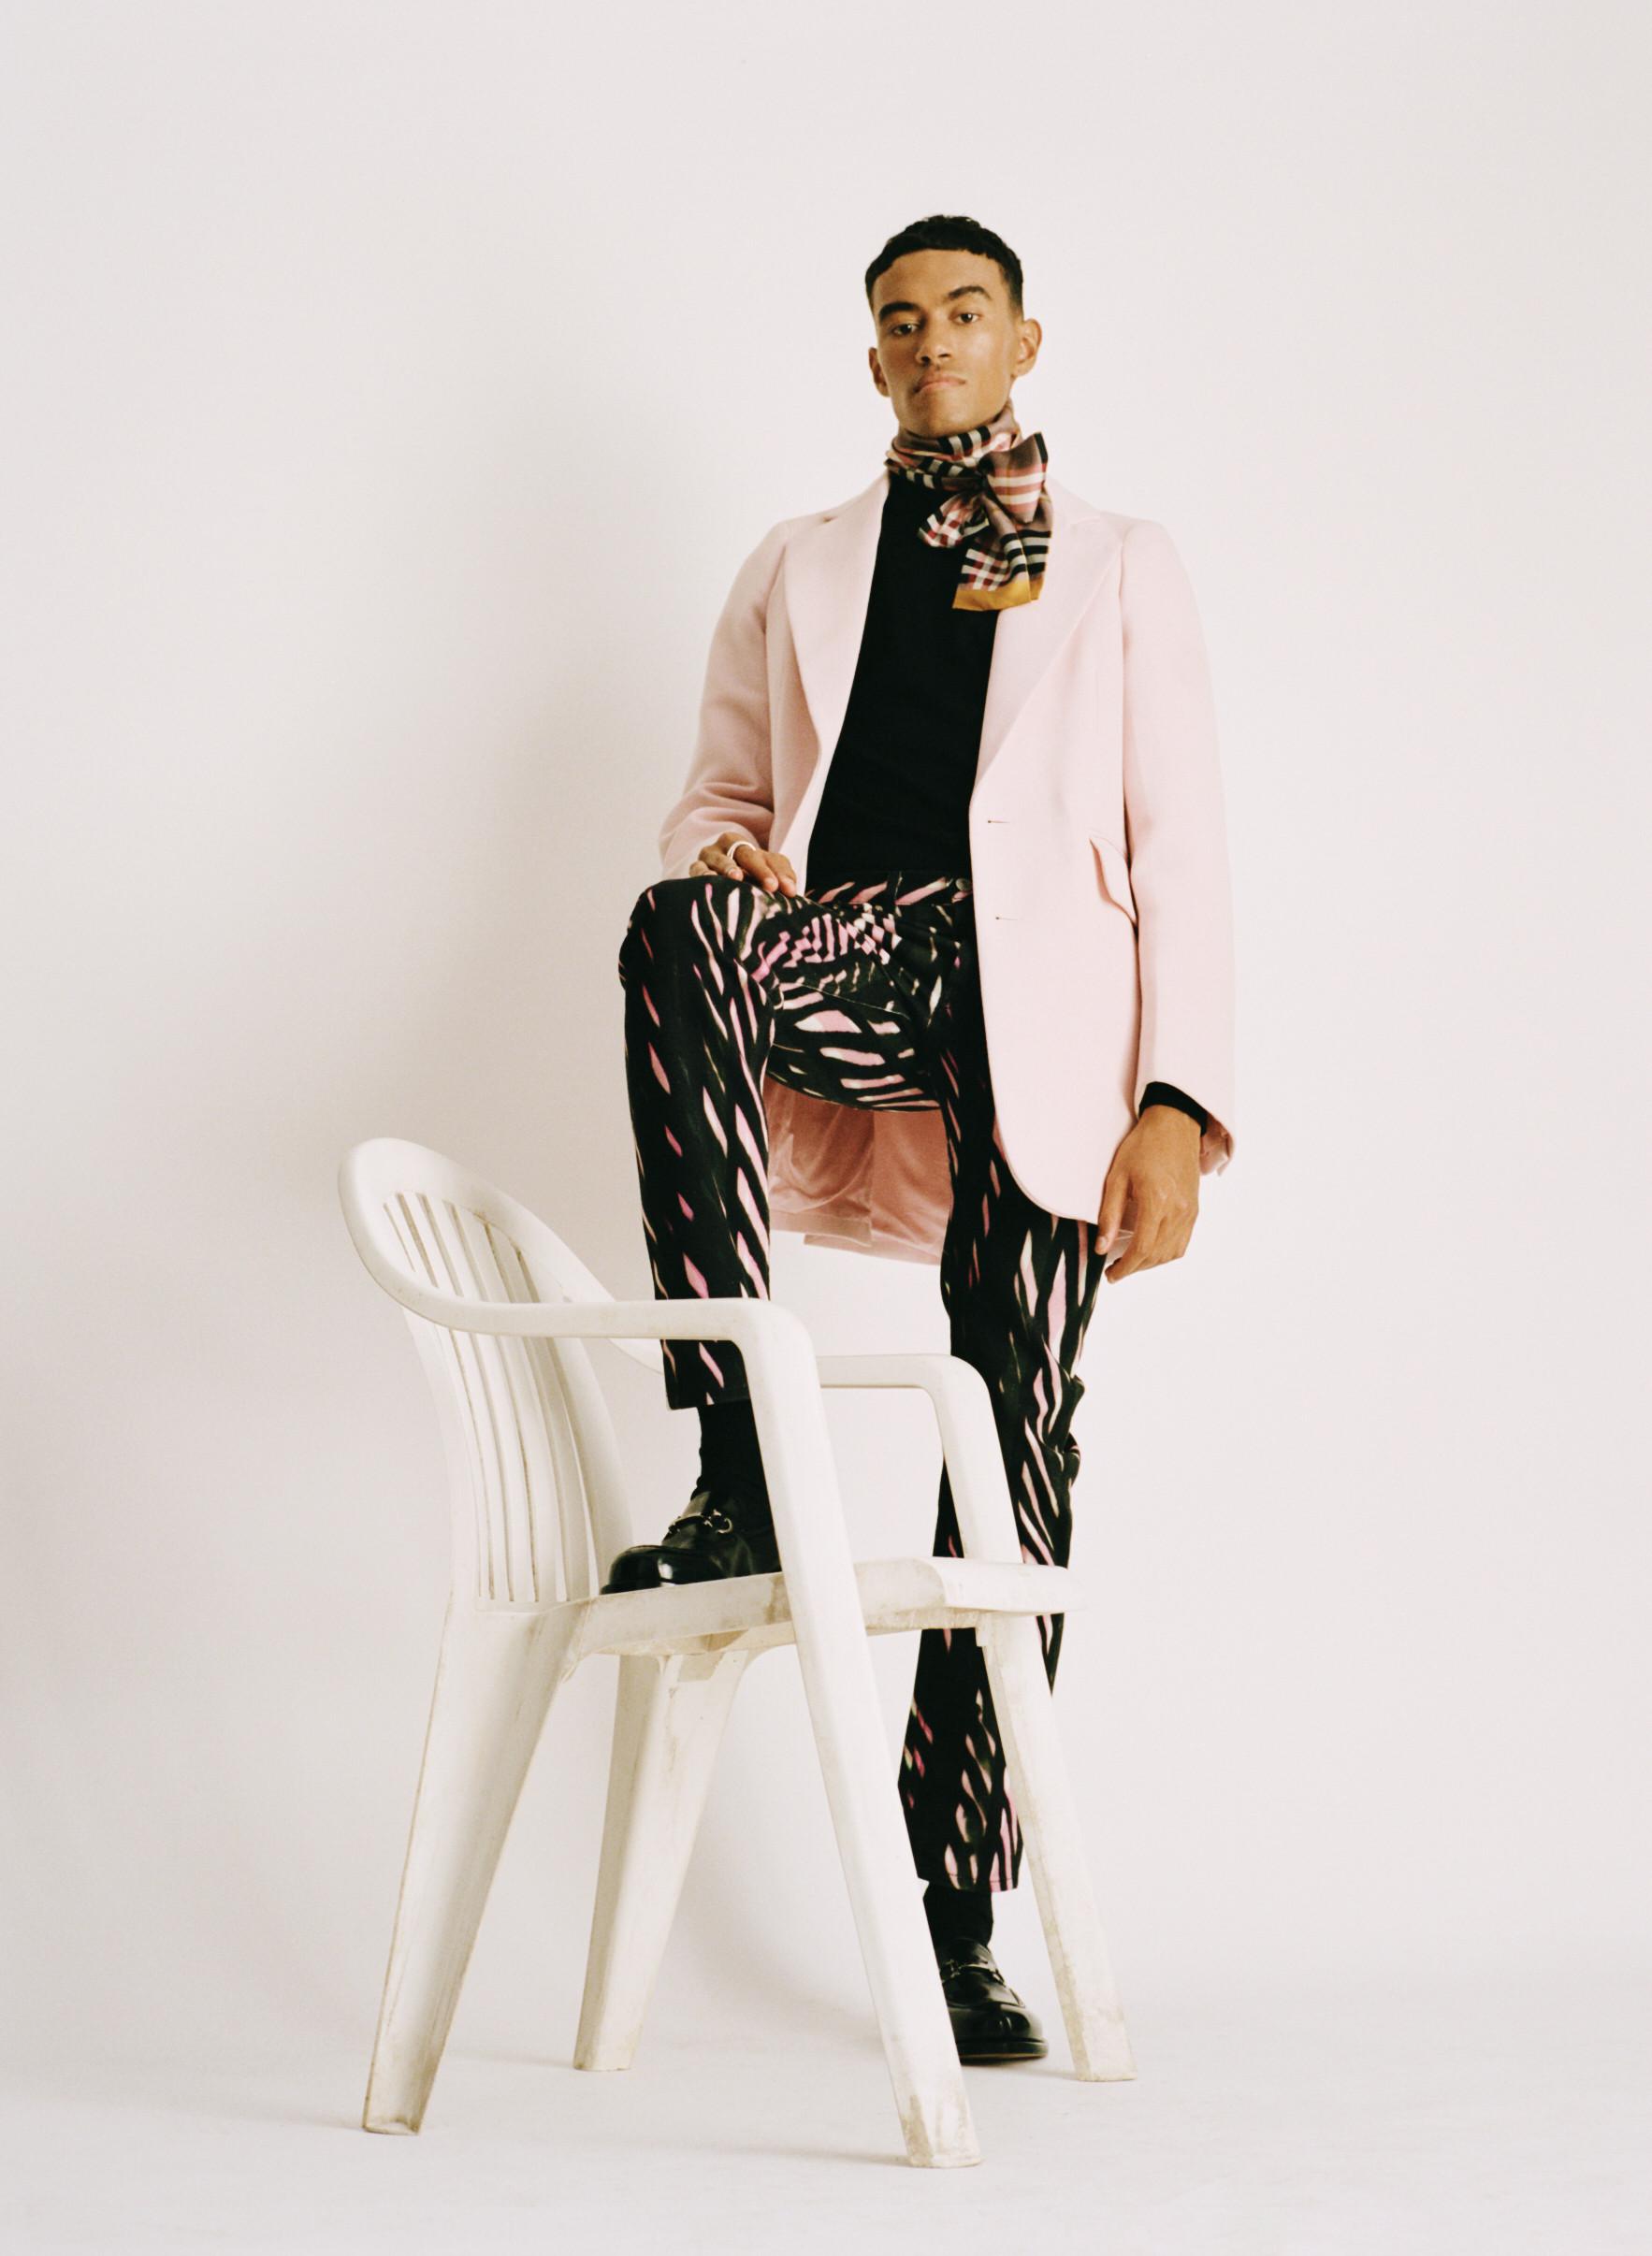 Jacket: Stylist's own Rollneck: Scotch & Soda Trousers: Dries Van Noten Shoes: Salvatore Ferragamo Neck-tie: Stylist's own Ring: Tom Wood